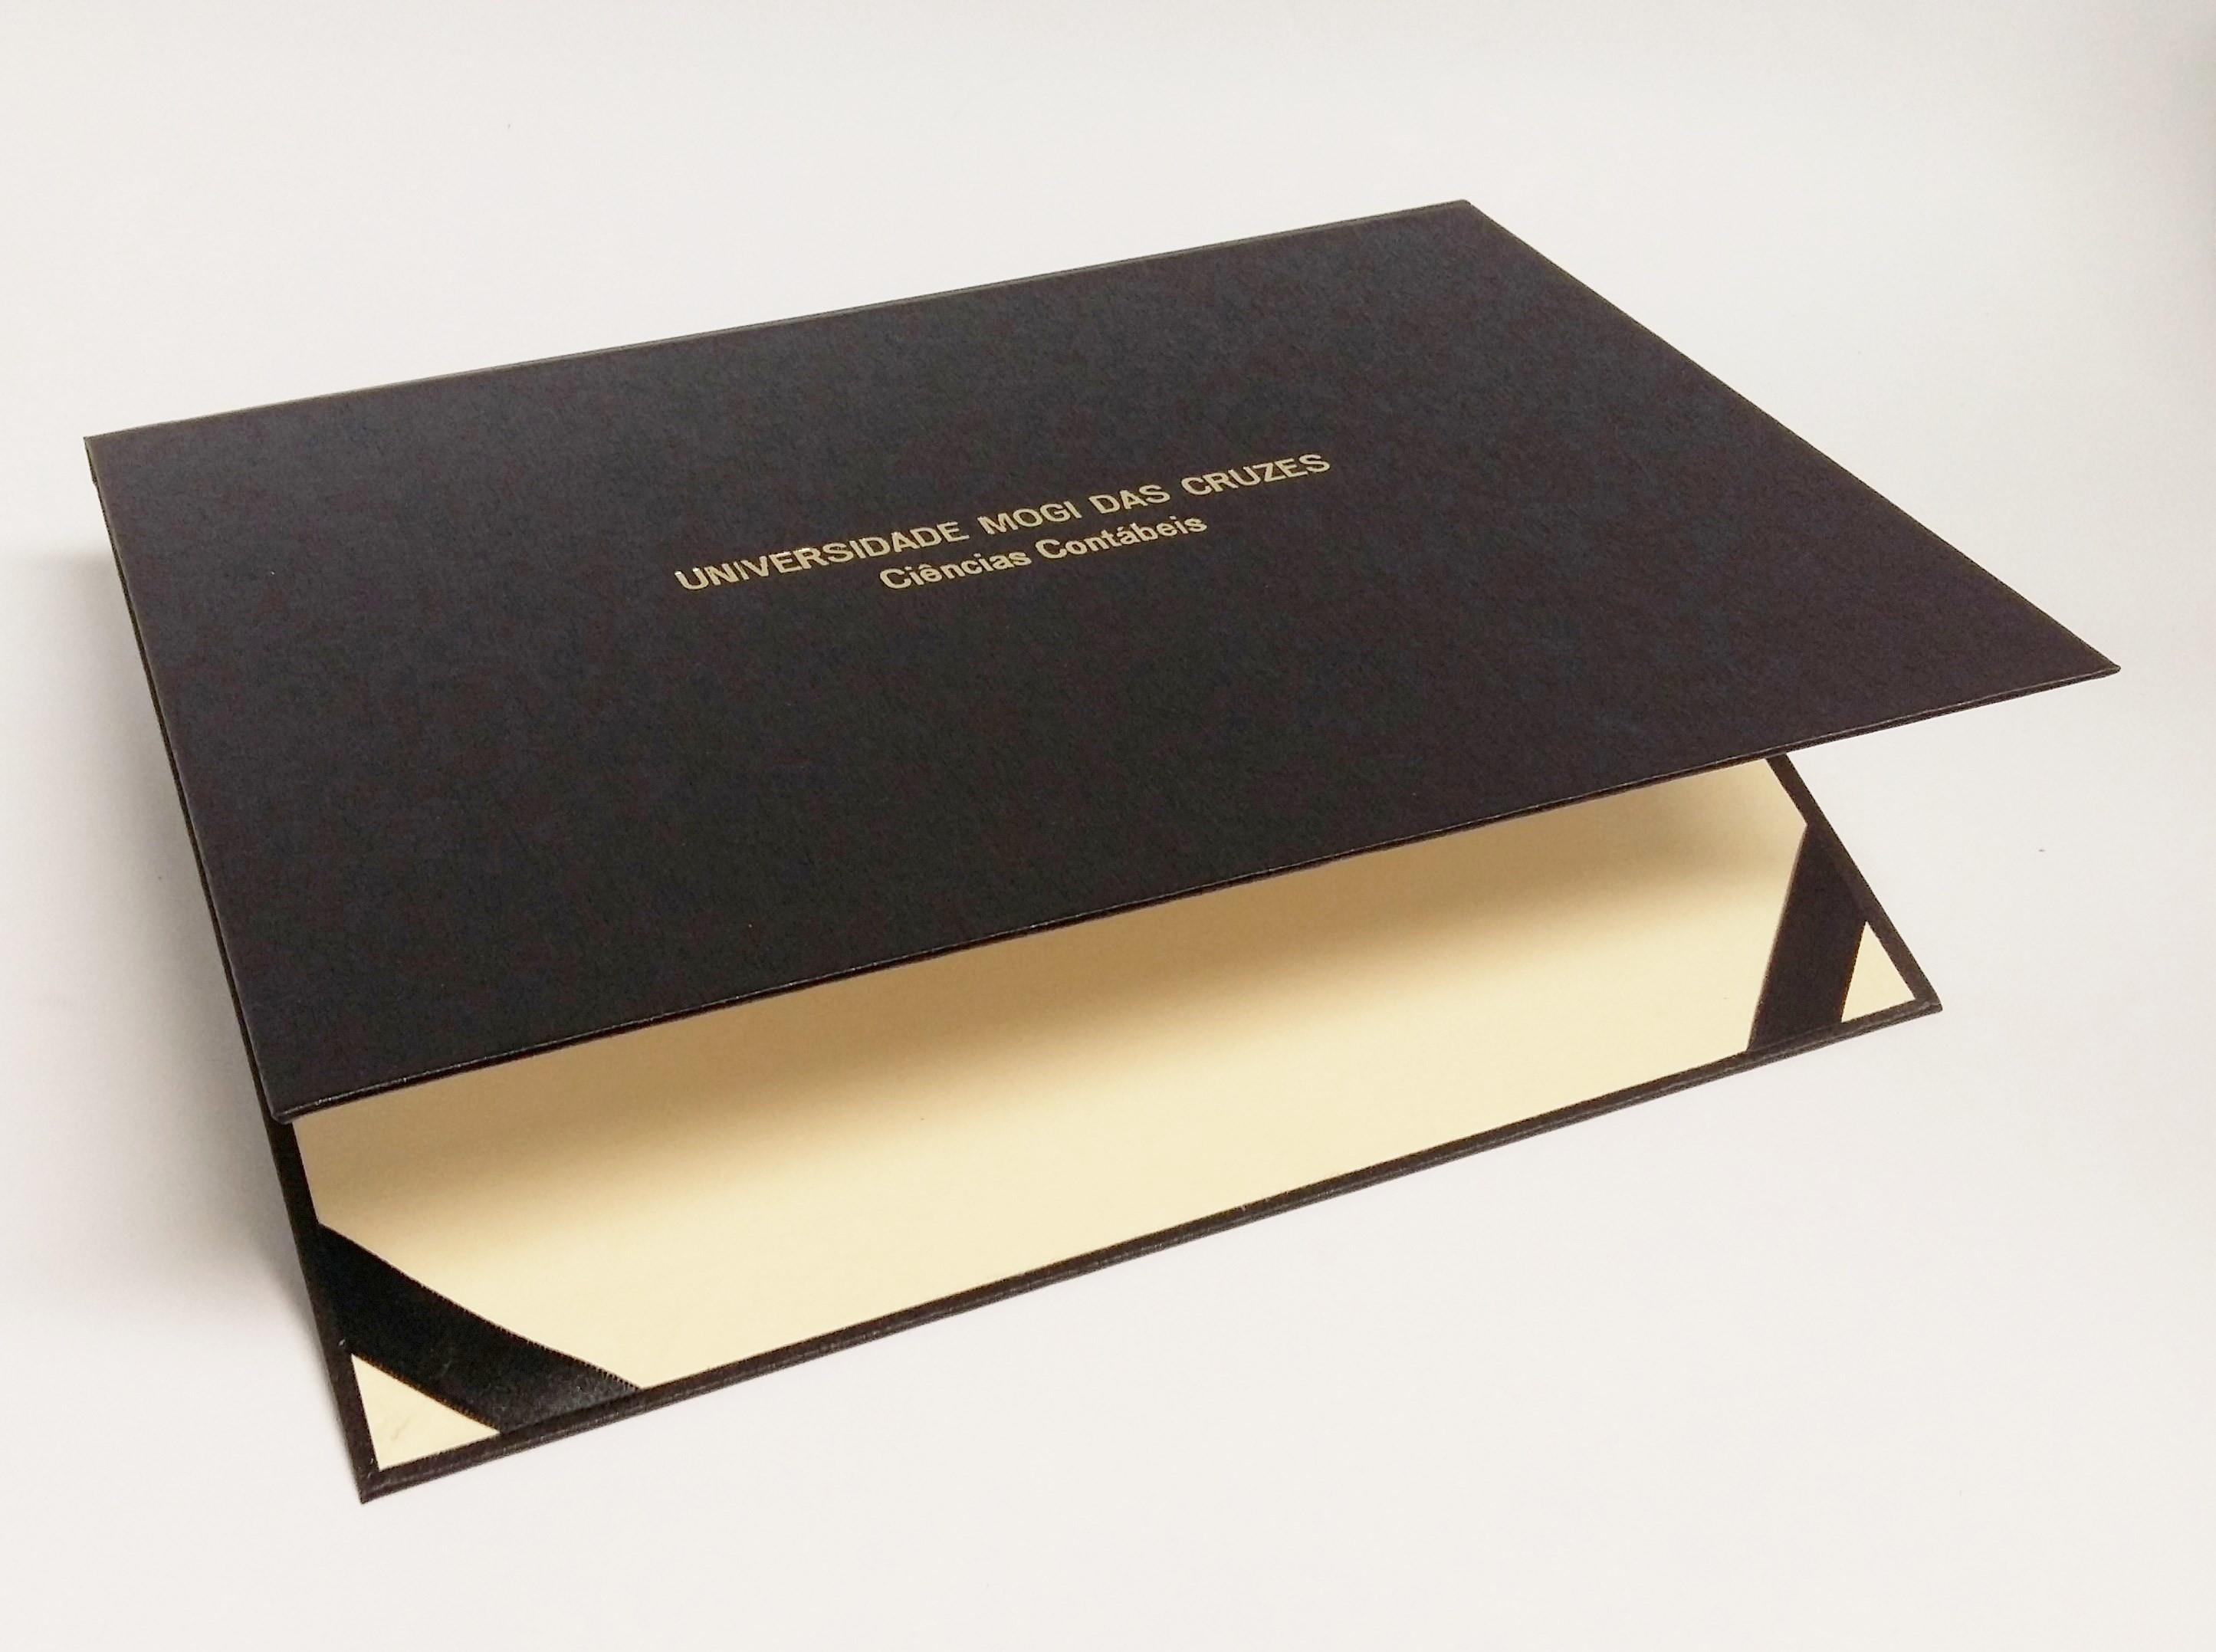 f8bb24248e1 Porta diploma /certificado A4 Personalizado- Diversas cores